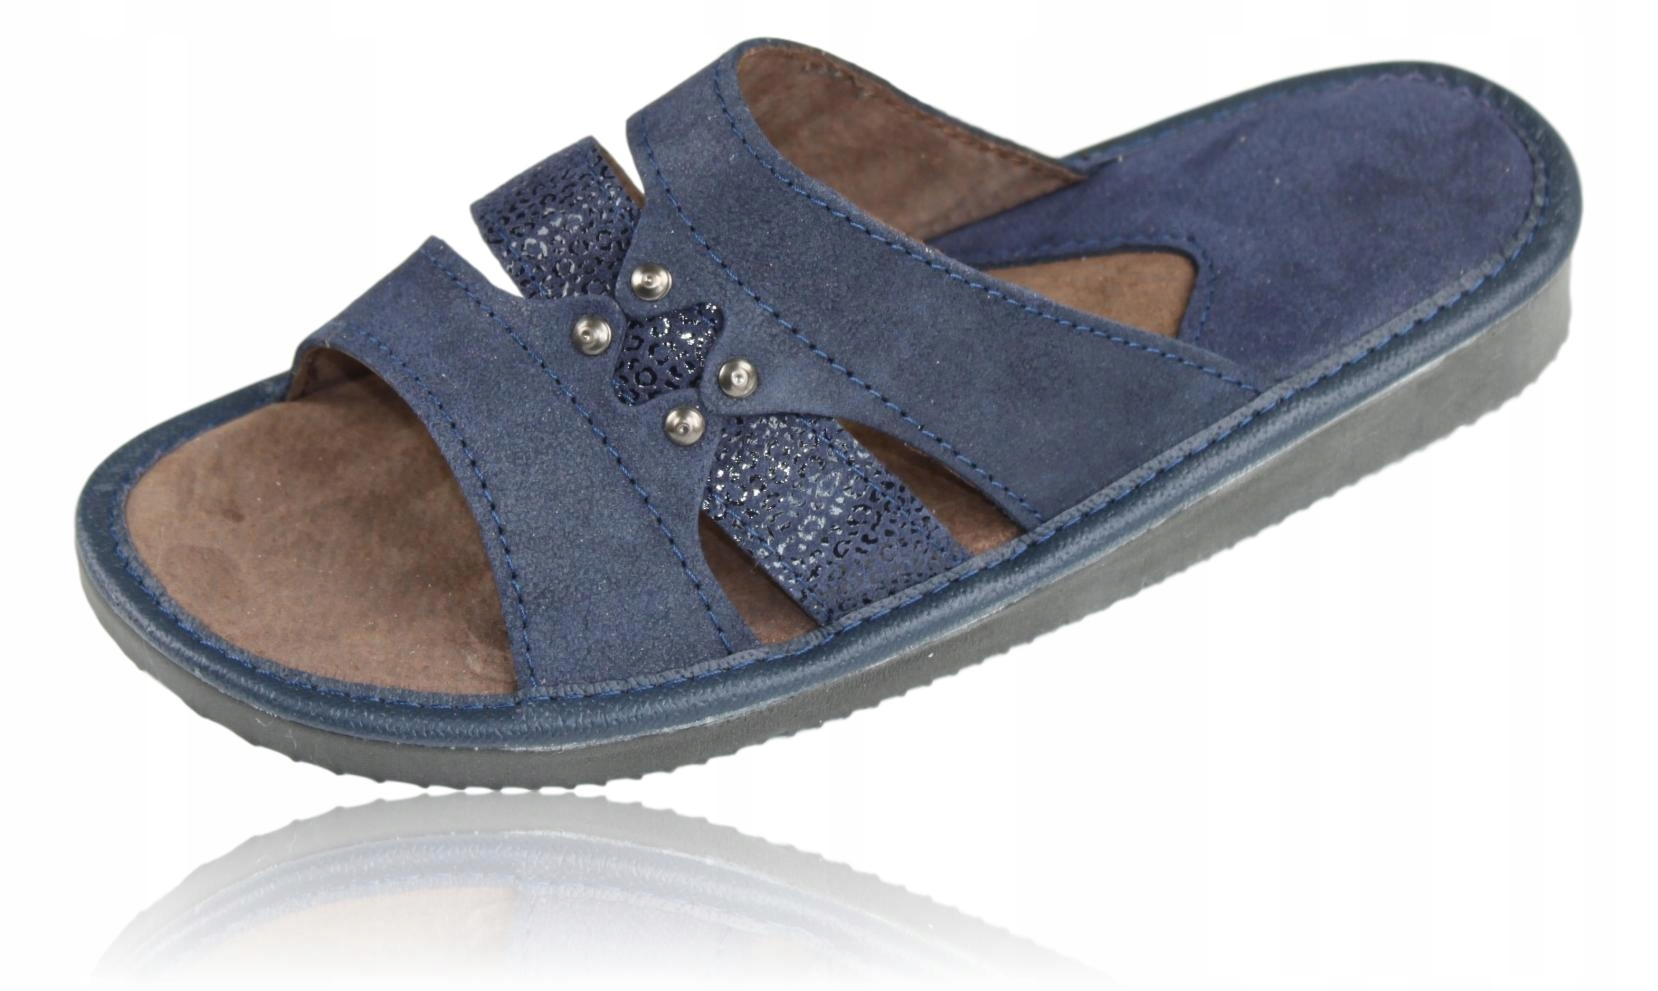 Klapki skórzane kapcie pantofle damskie 1147 40 gr